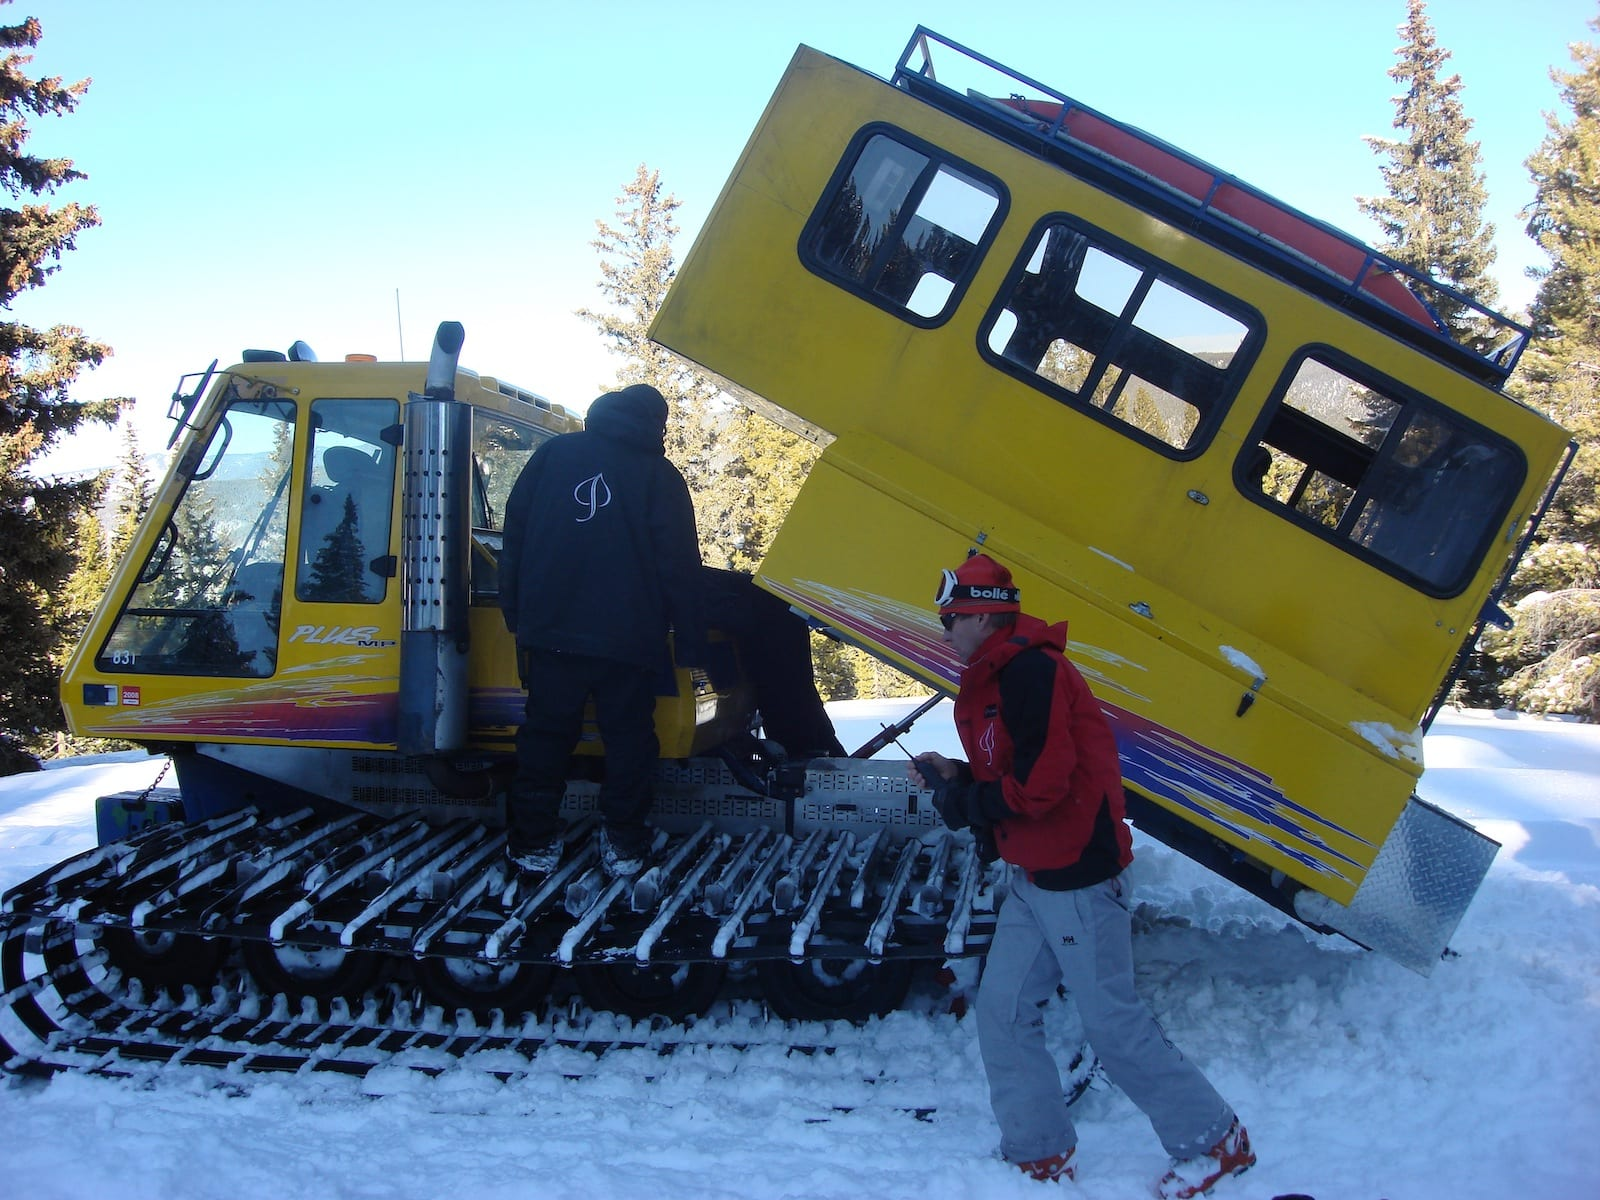 Aspen Powder Tours Snowcat Skiing